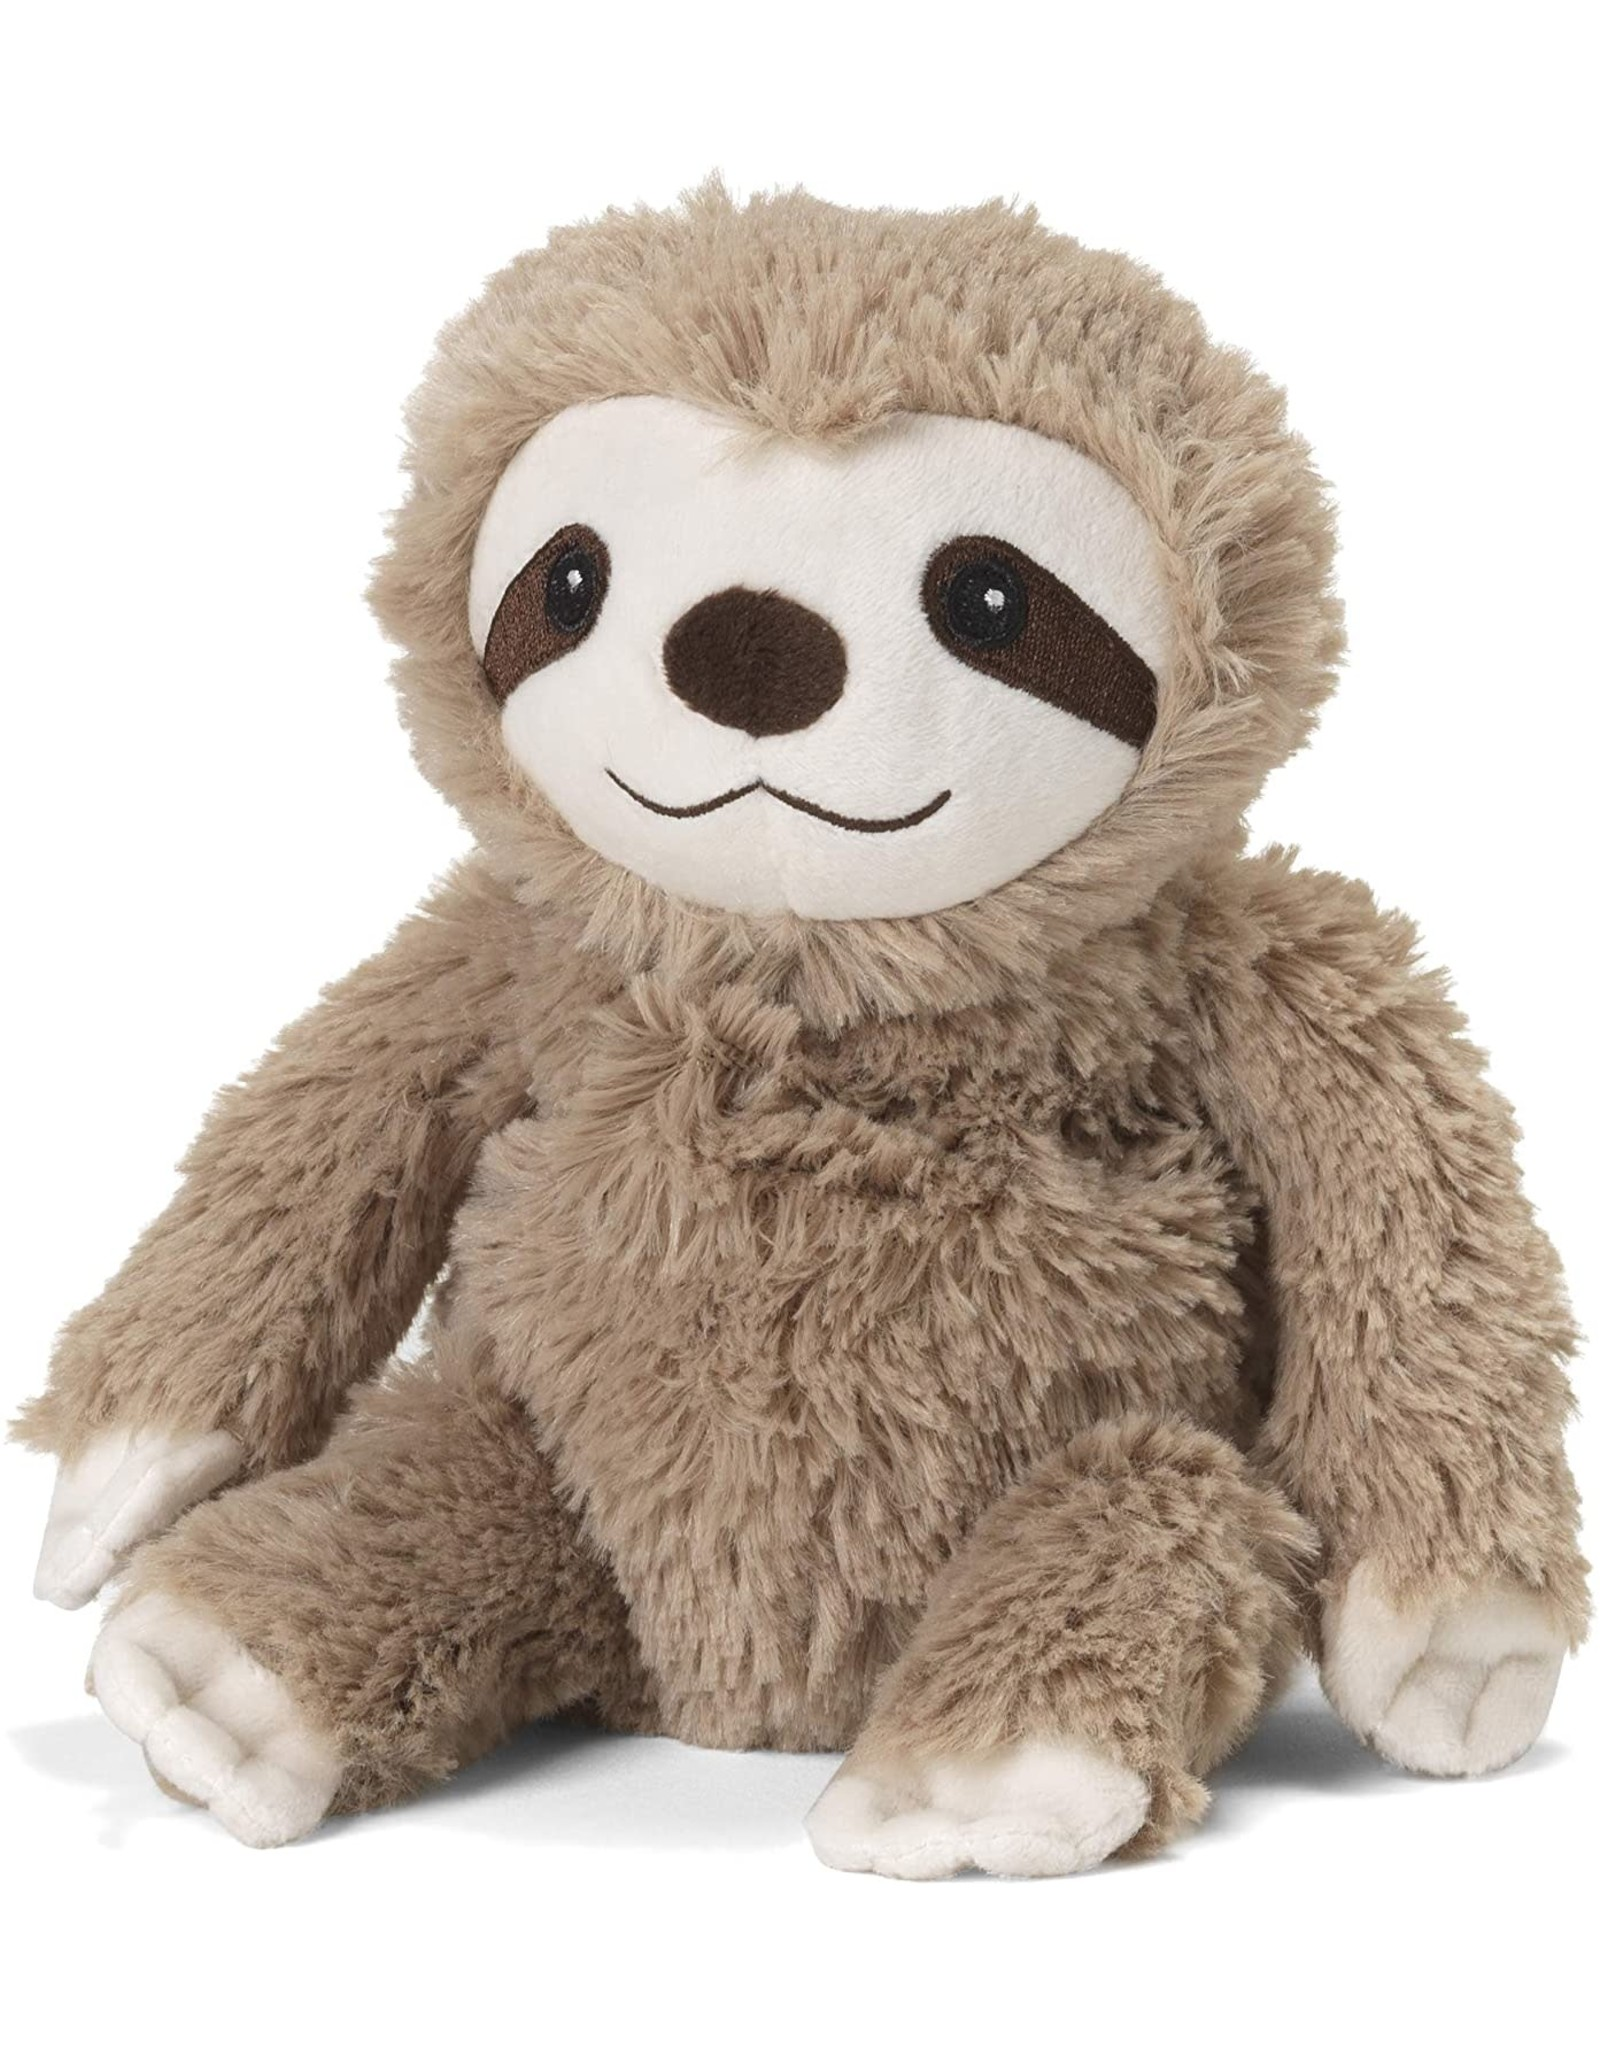 "Warmies Warmies PLUSH Sloth (13"")"